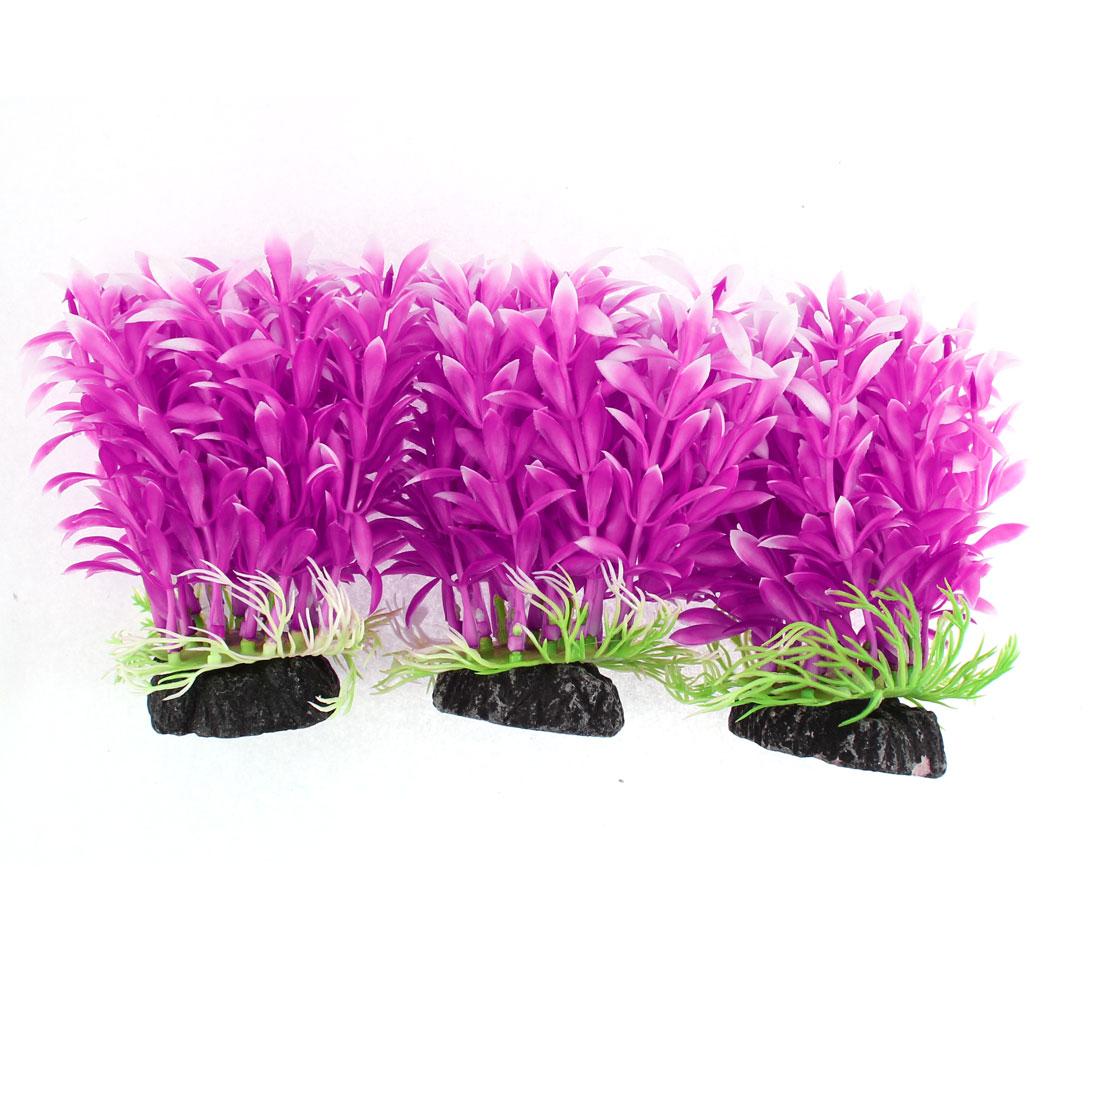 Fishbowl Aquarium Plastic Imitated Grass Plants Purple 12 x 11cm 3pcs